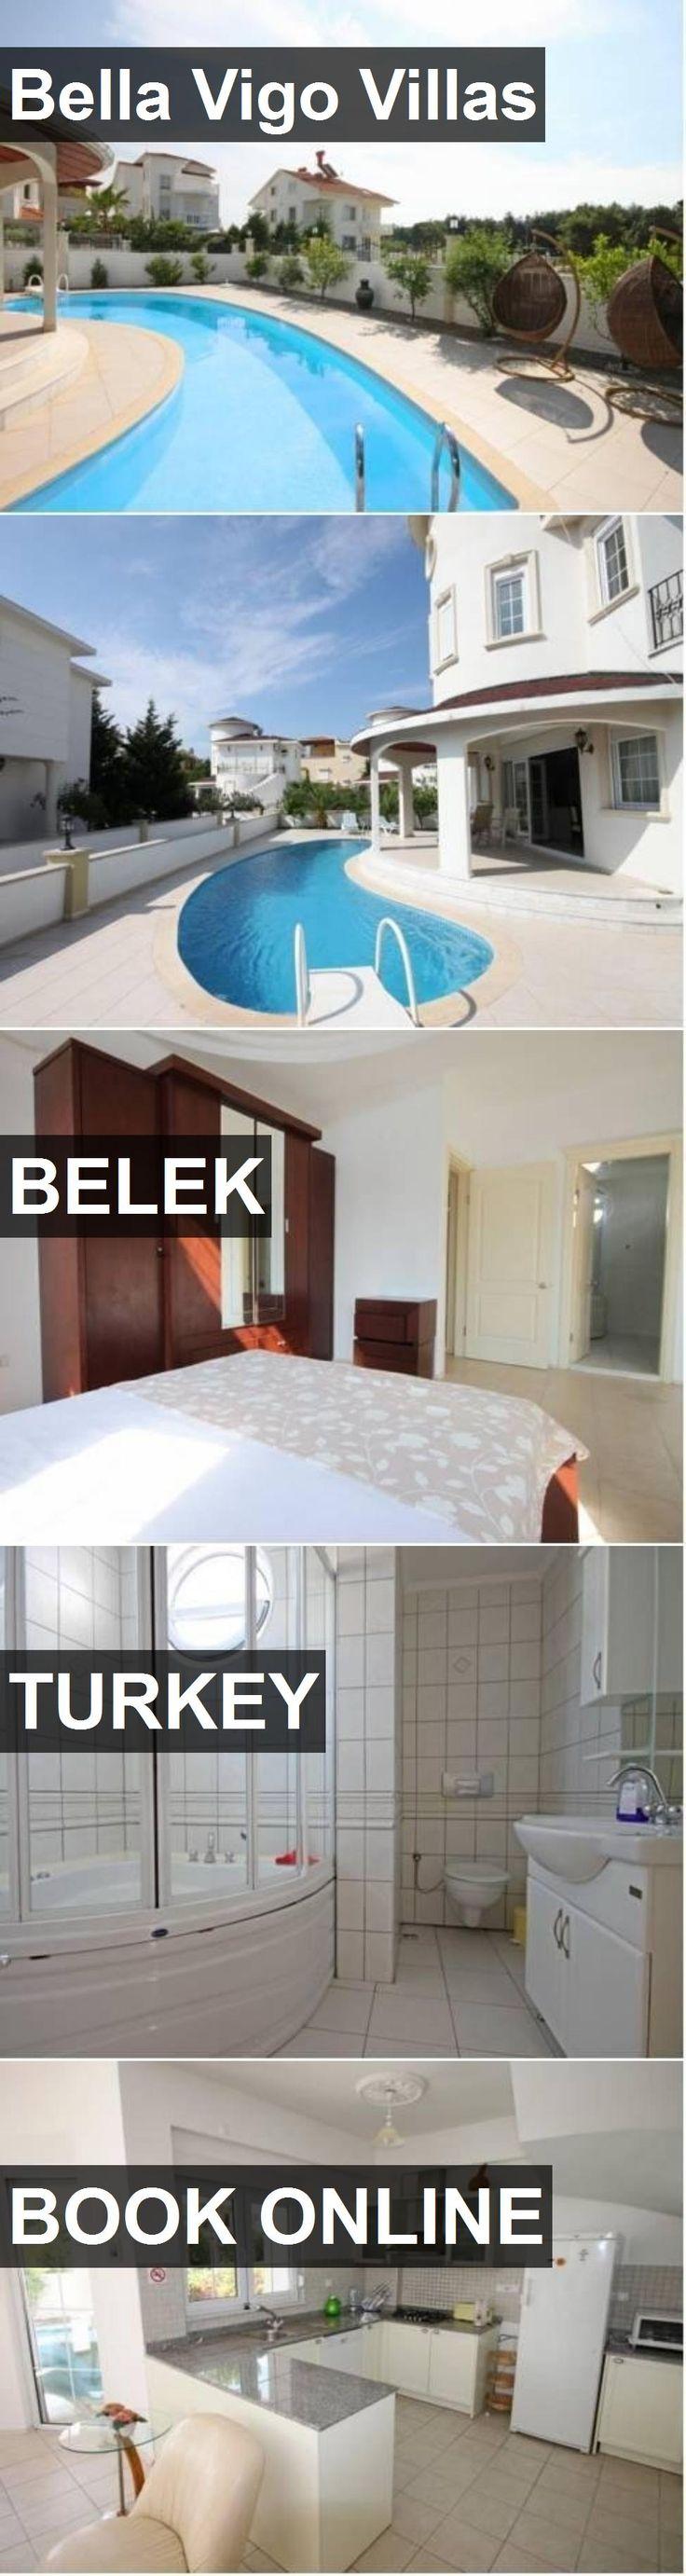 Hotel Bella Vigo Villas in Belek, Turkey. For more information, photos, reviews and best prices please follow the link. #Turkey #Belek #BellaVigoVillas #hotel #travel #vacation